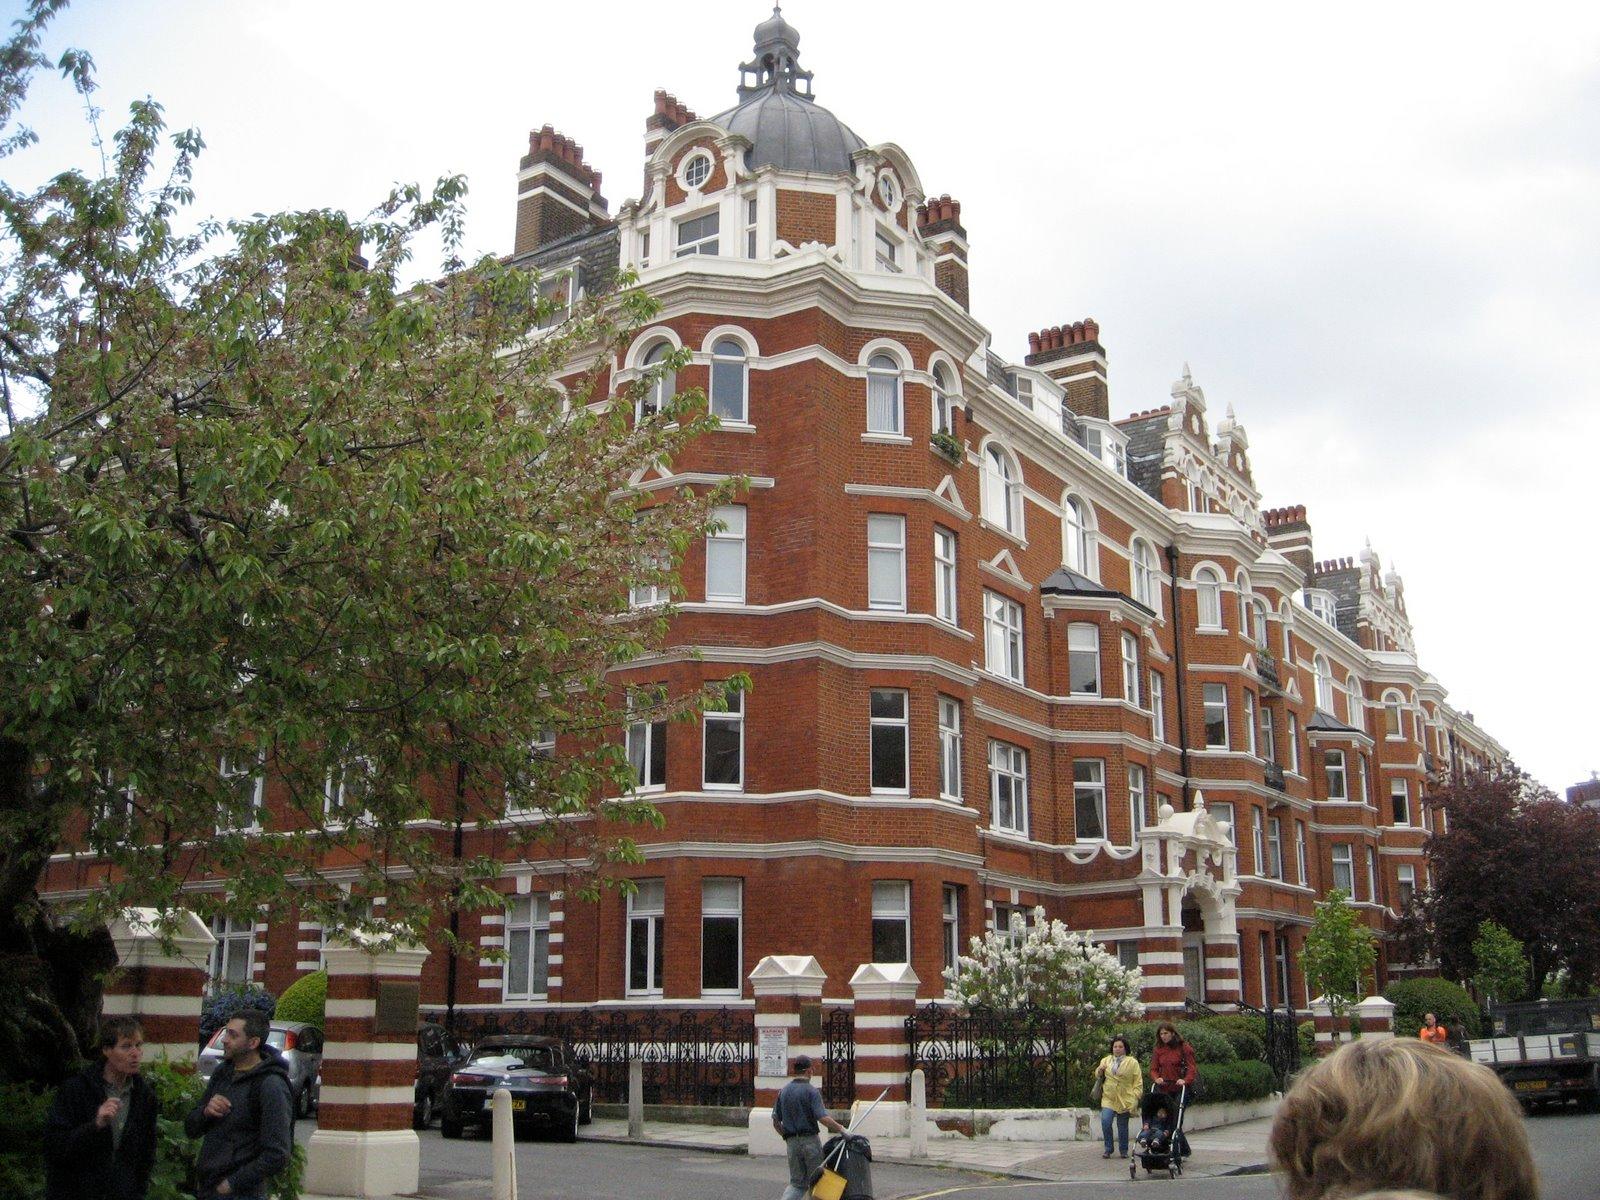 bokorelo little venice london walk. Black Bedroom Furniture Sets. Home Design Ideas